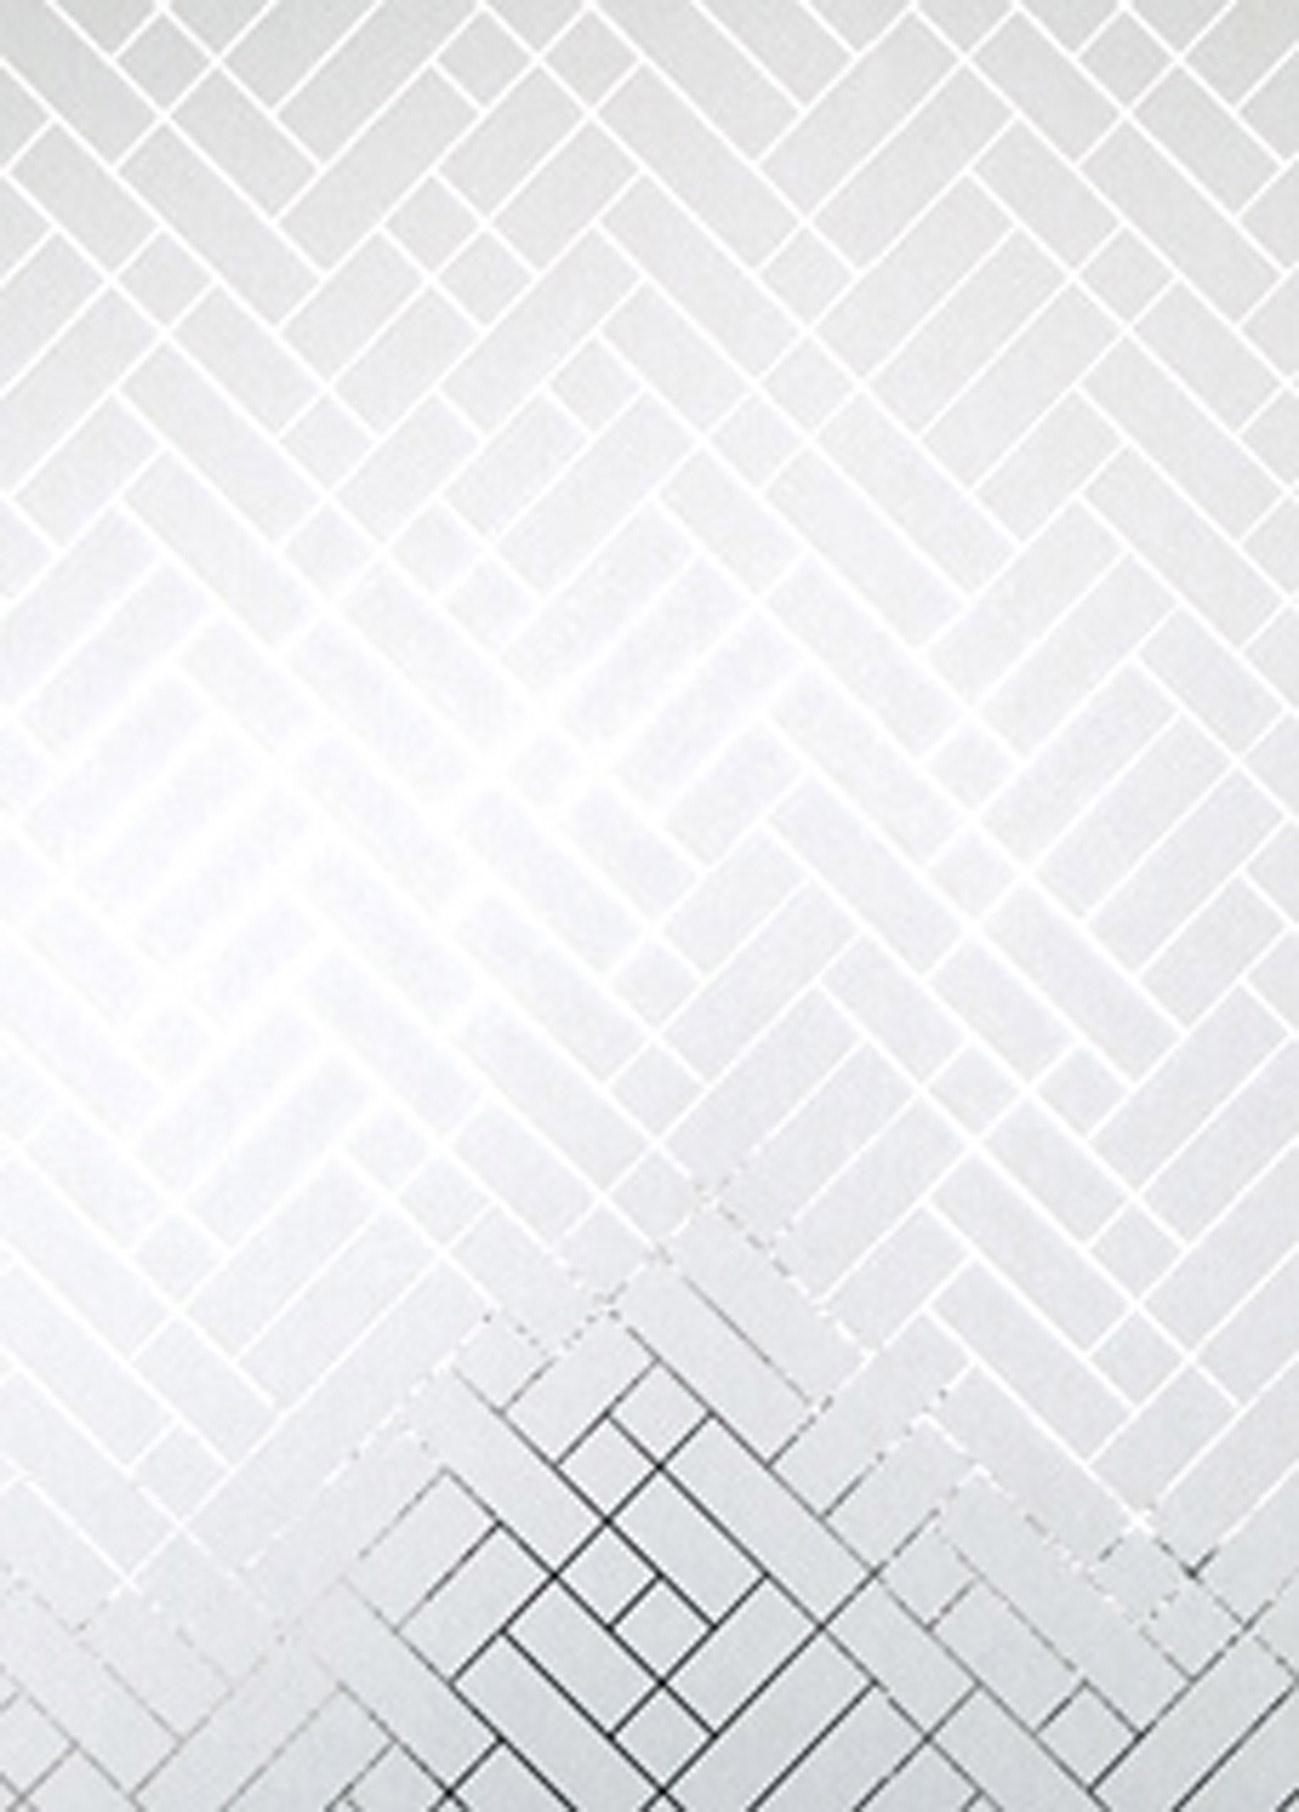 Silver Wallpaper Design Whitesilver wallpaper 1299x1812